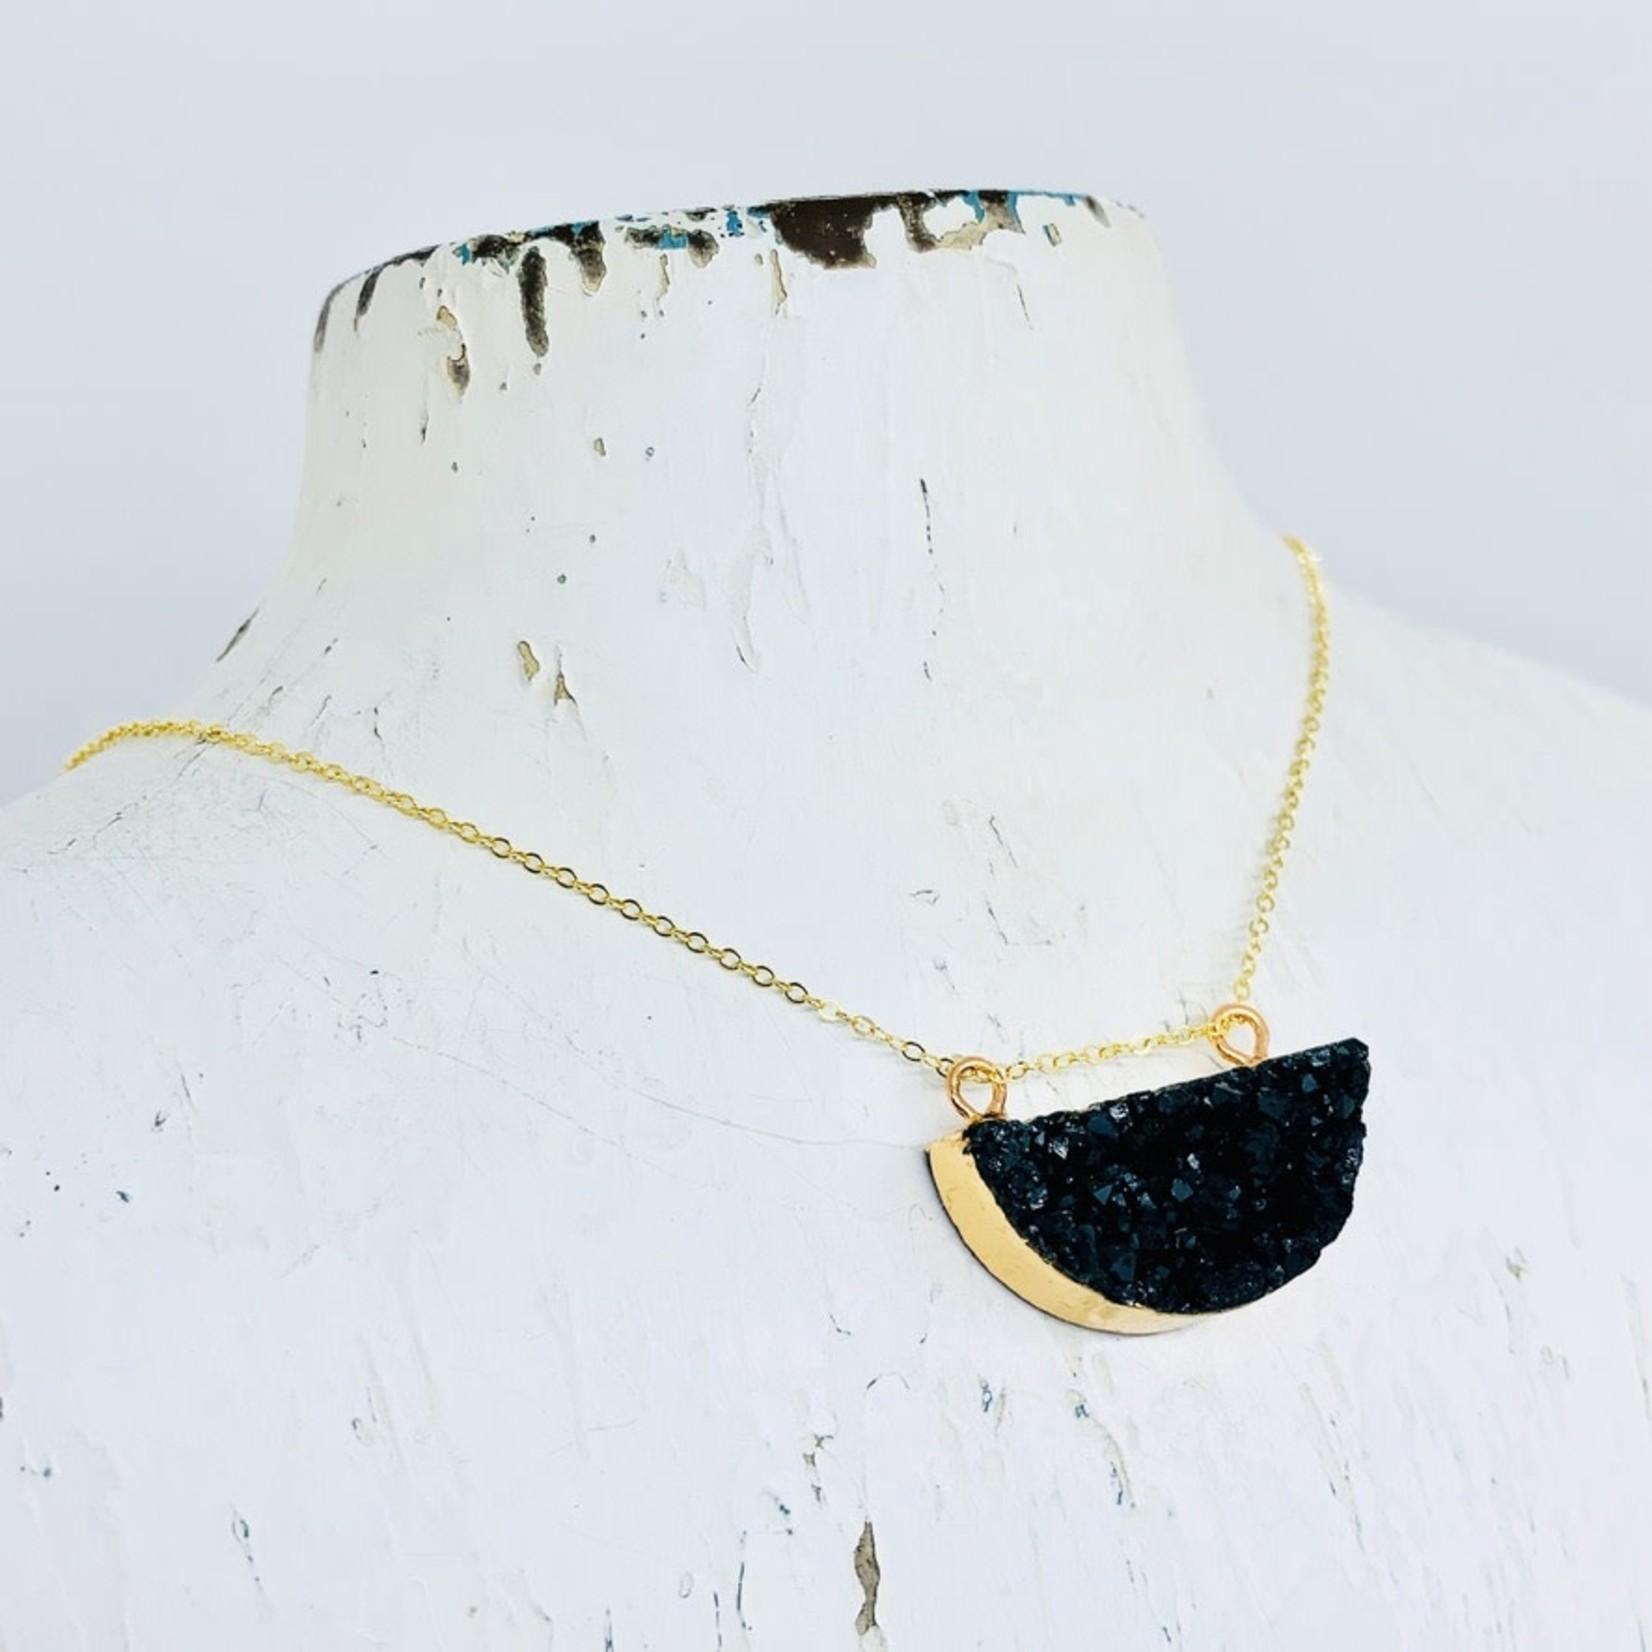 Handmade 14k Goldfill Necklace with Black Half Moon Druzy